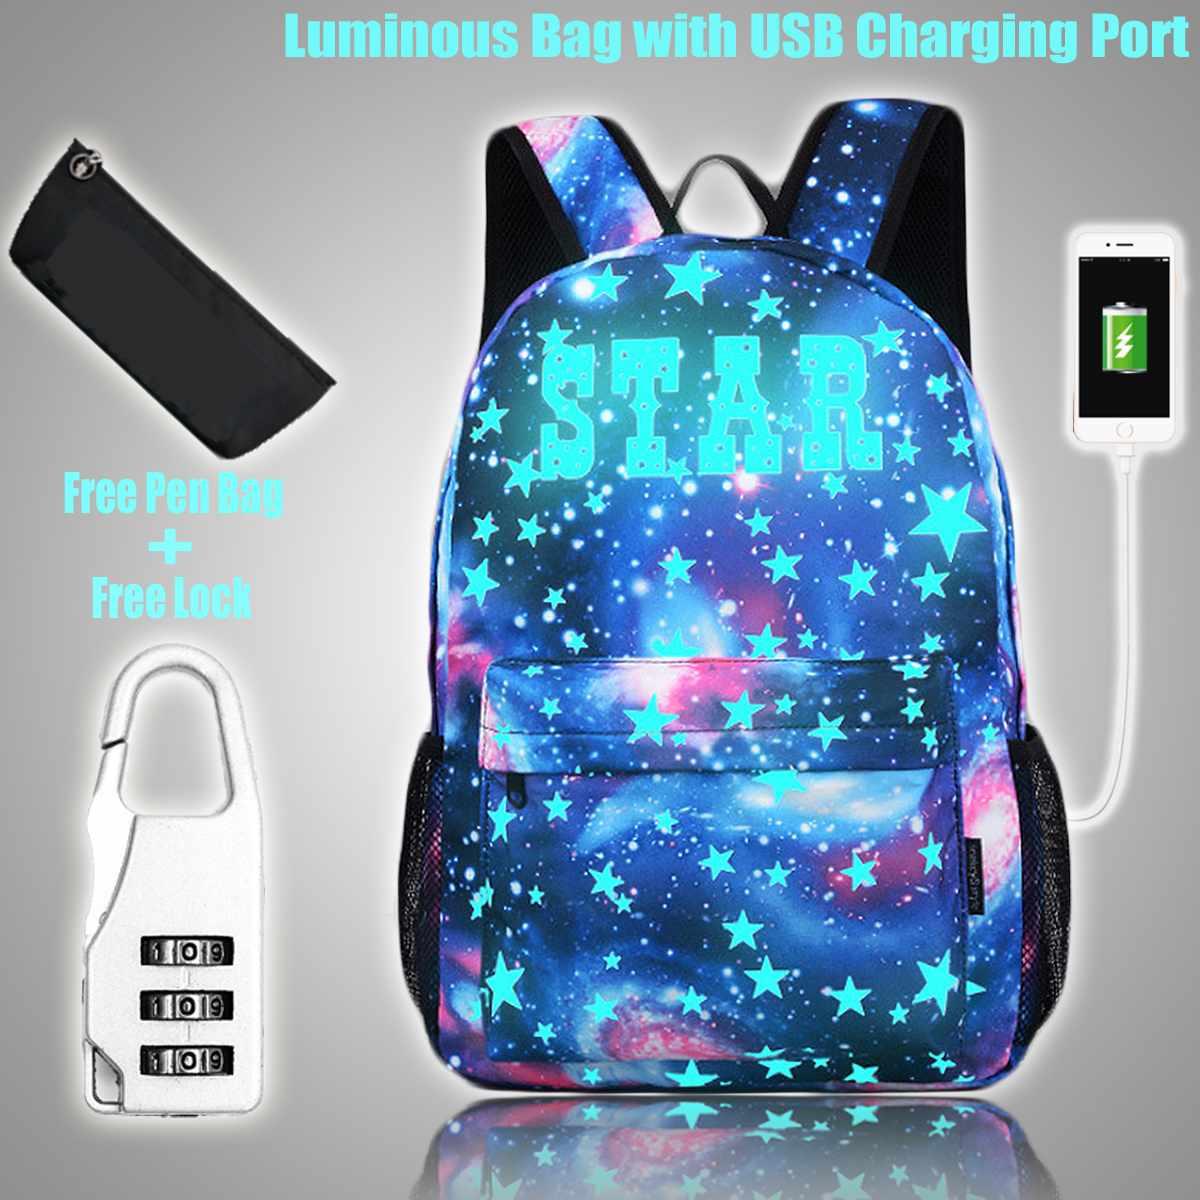 Mochila escolar luminosa para estudiante, mochila escolar para niño y niña con puerto de carga USB, bolsa de bolígrafo con bloqueo antirrobo para Camping y viajes